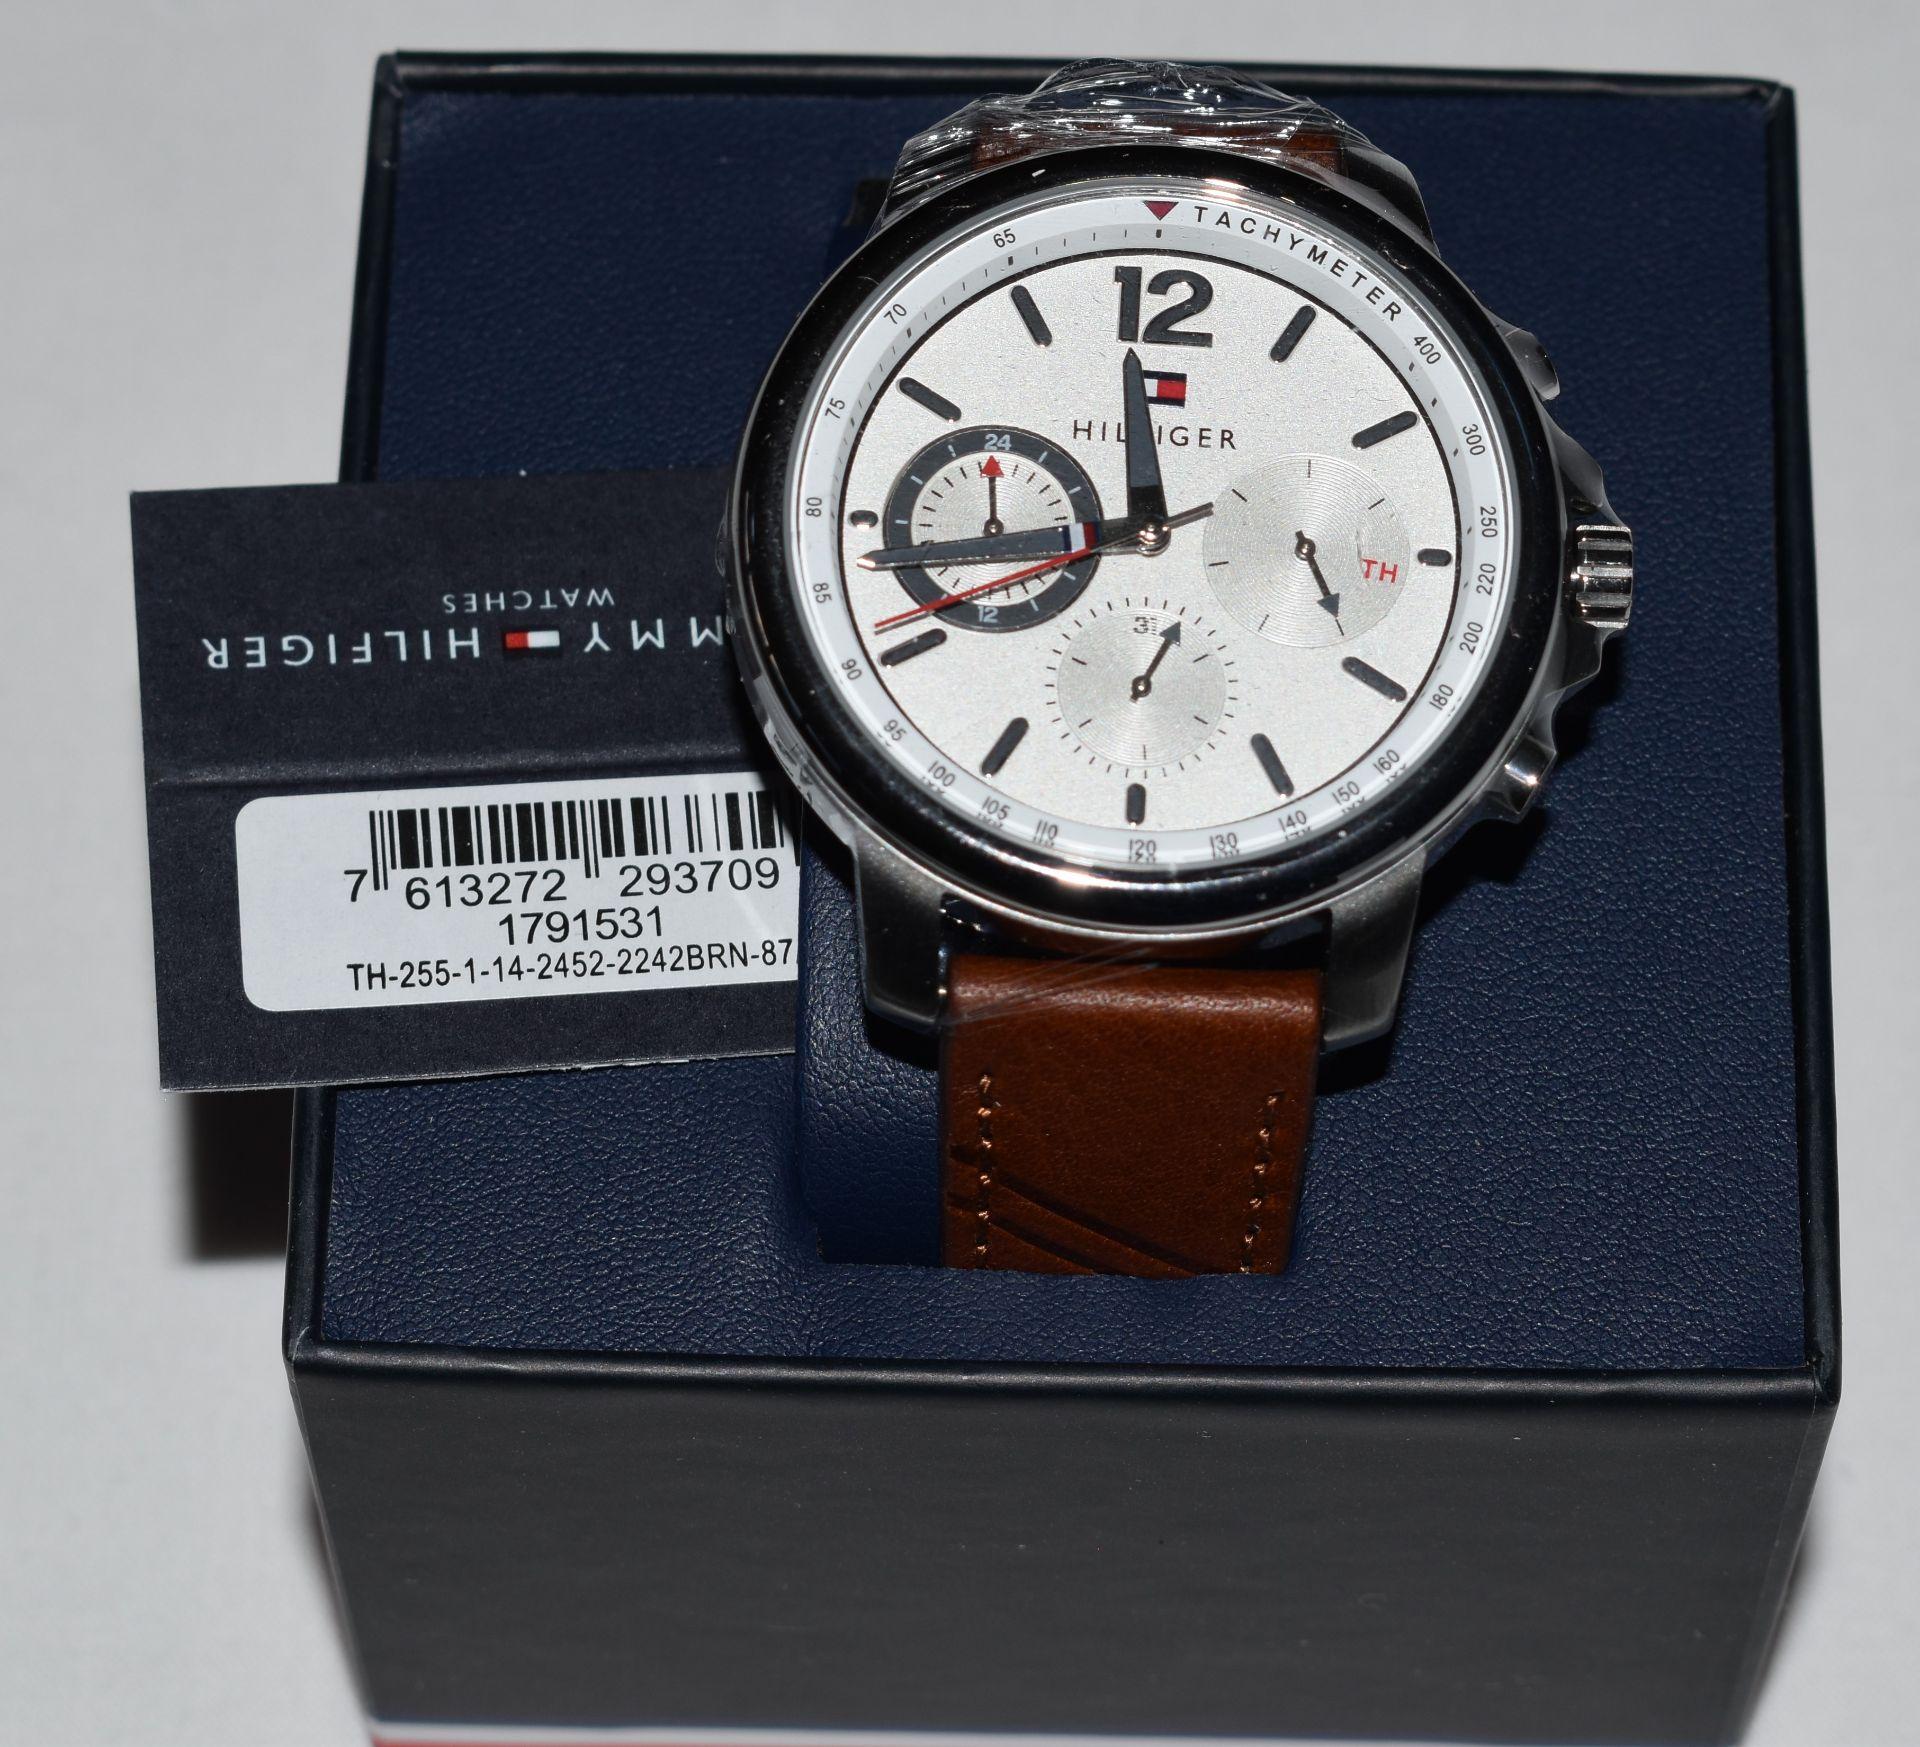 Tommy Hilfiger Men's Watch 1791531 - Image 2 of 2